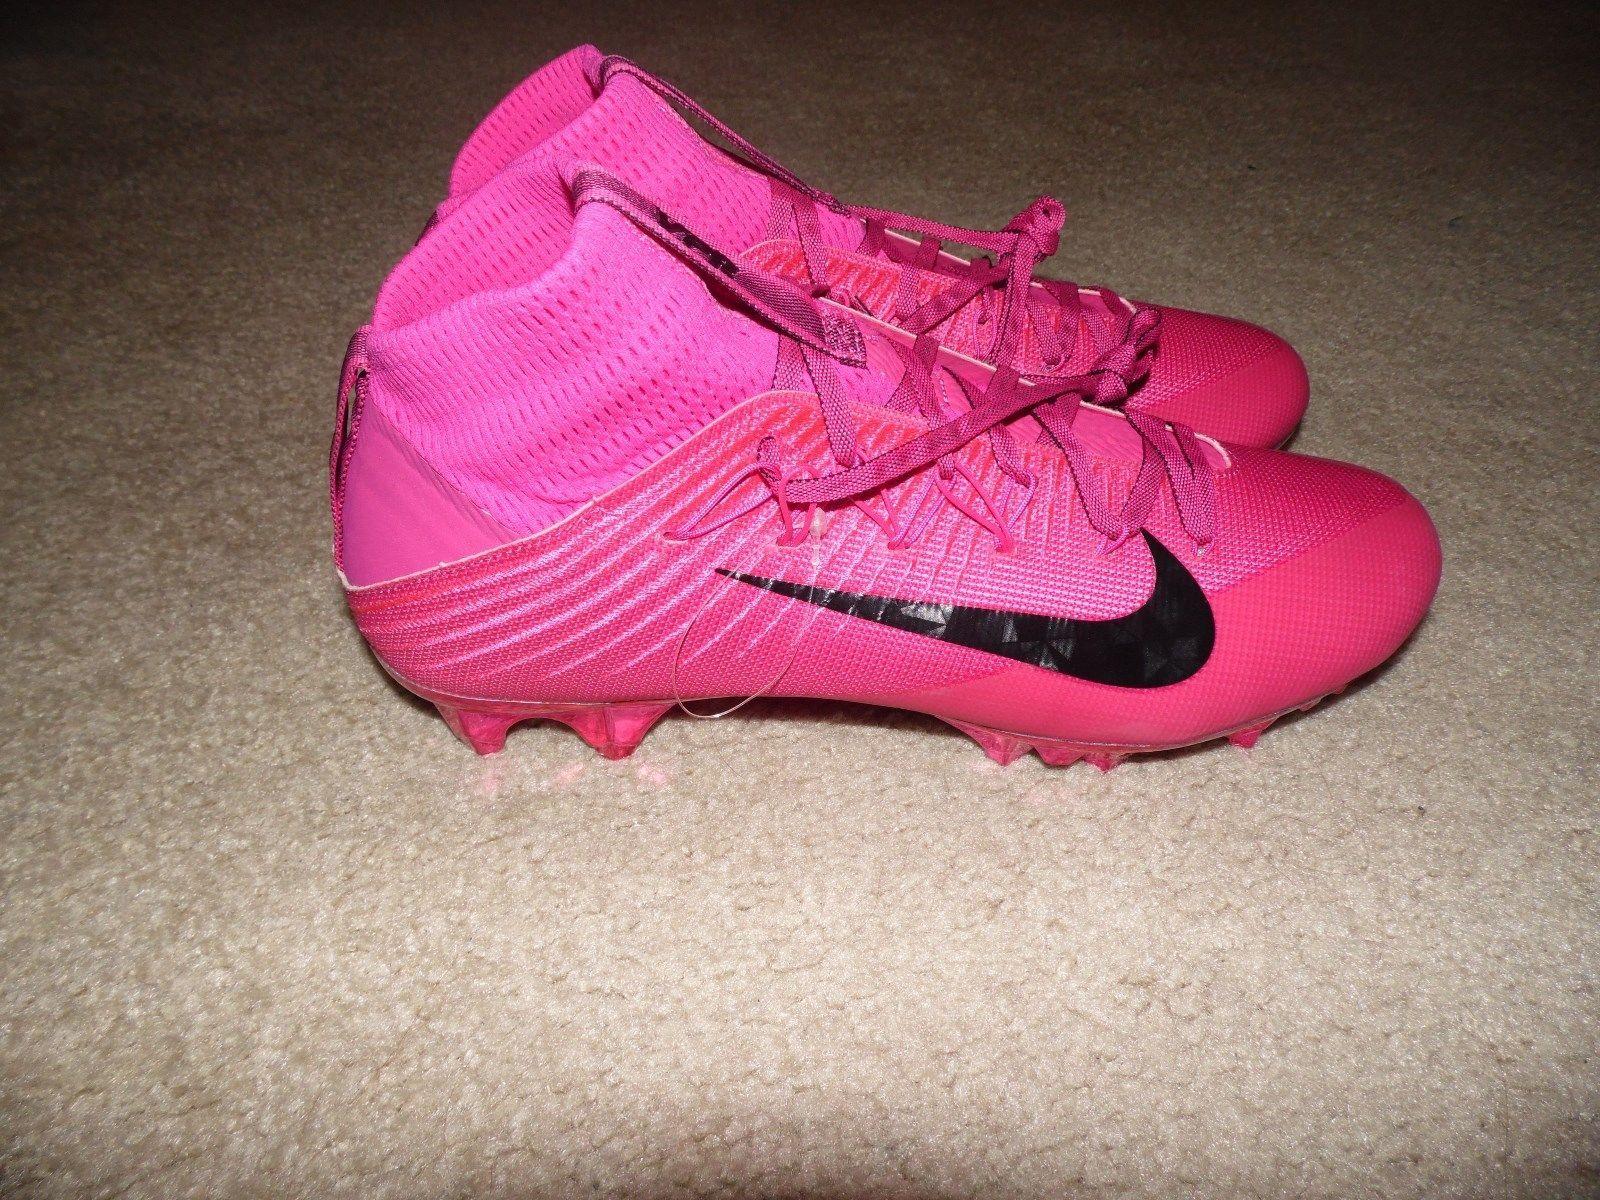 mens pink football cleats Shop Clothing